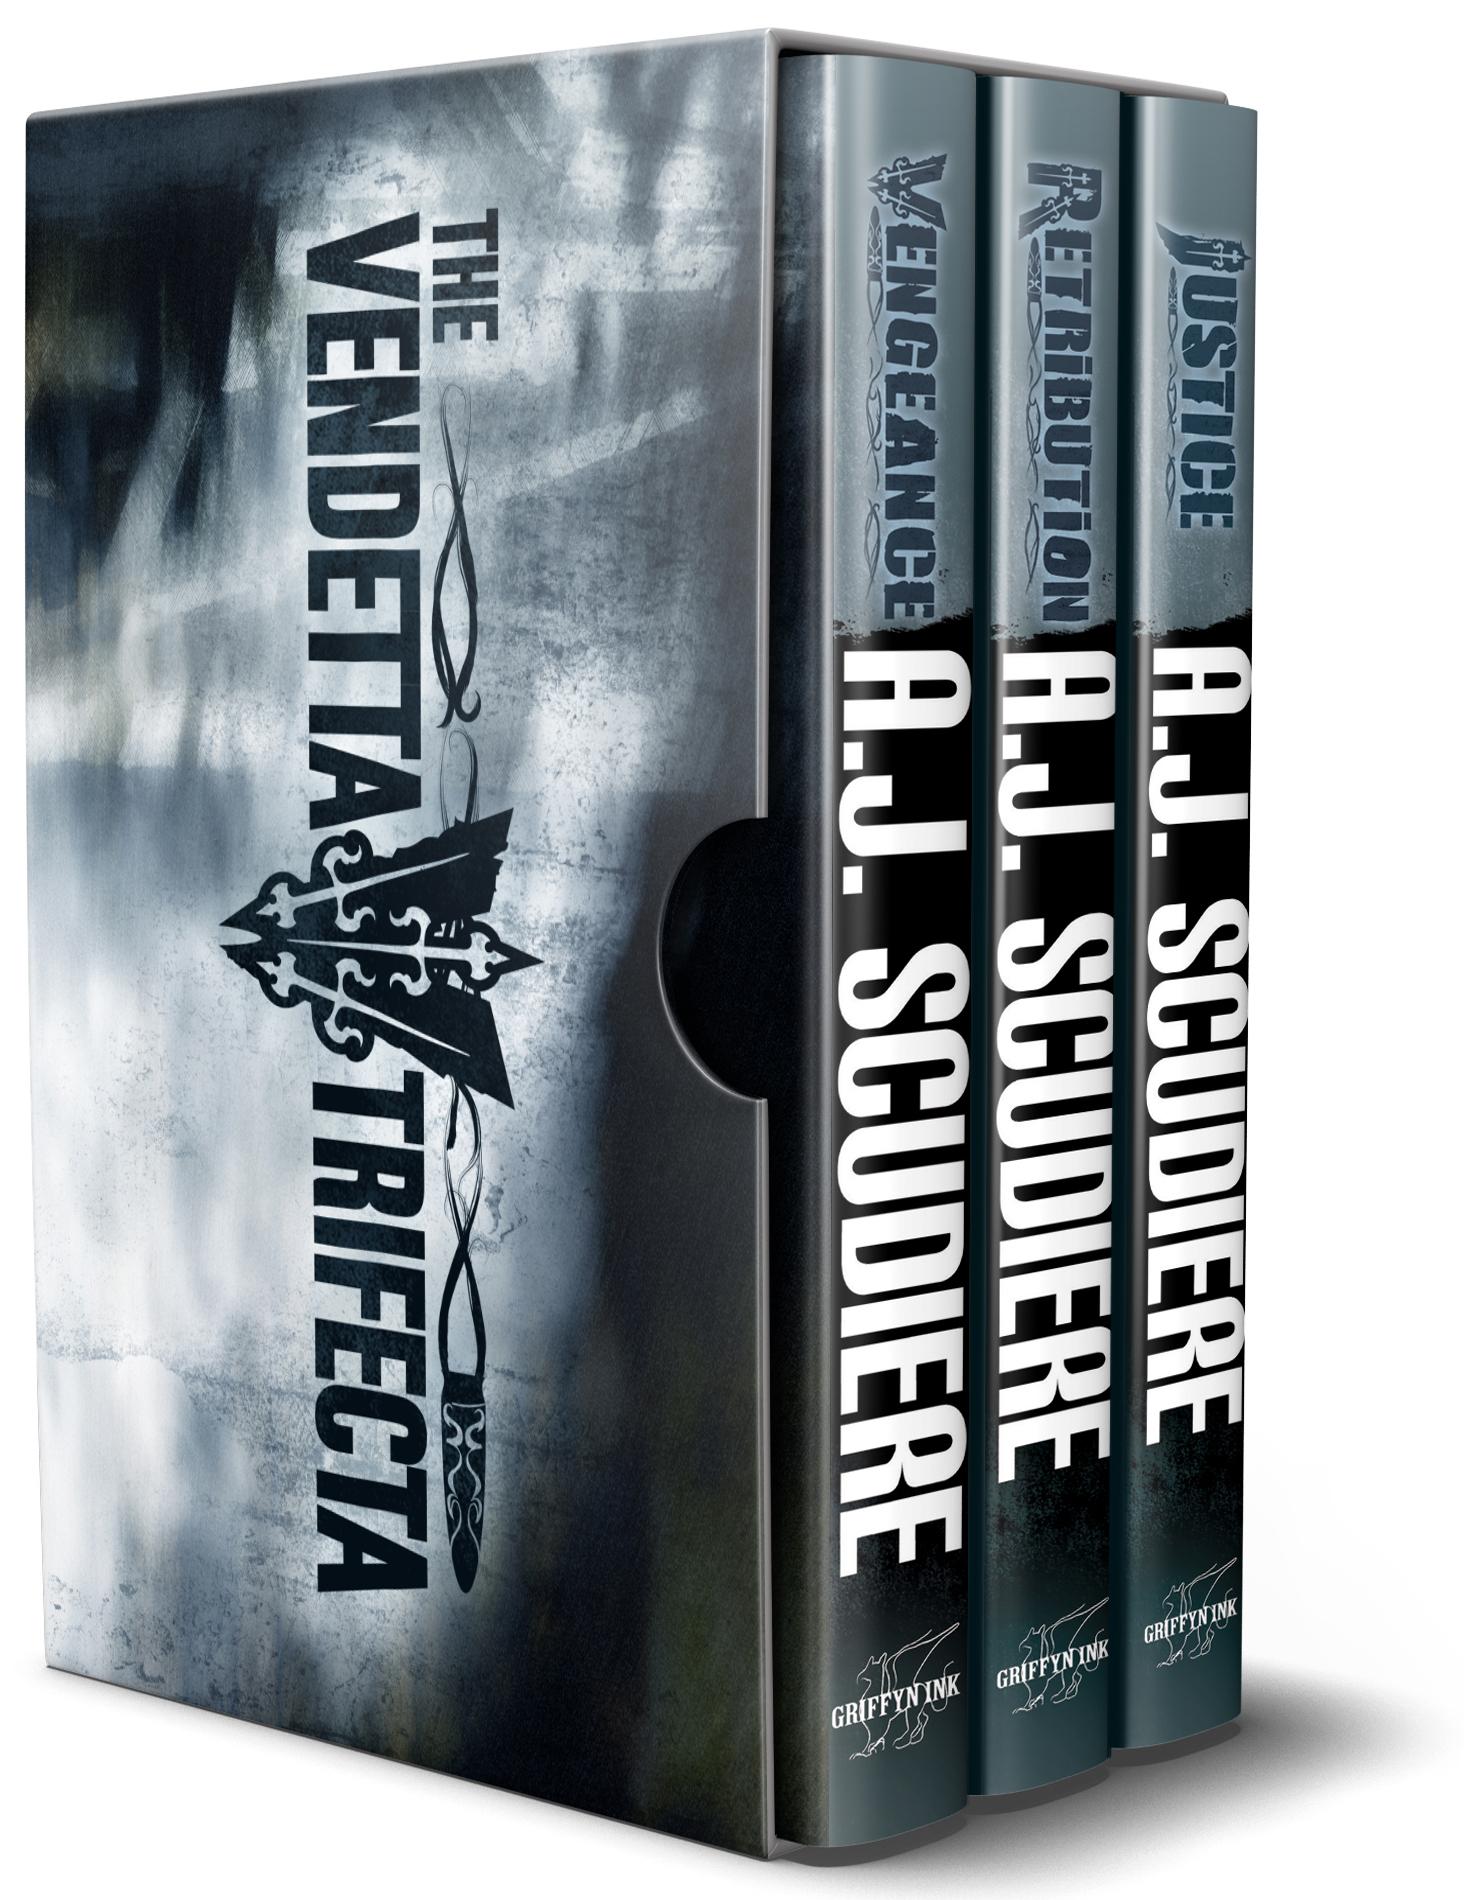 The Vendetta Trifecta Boxed Set